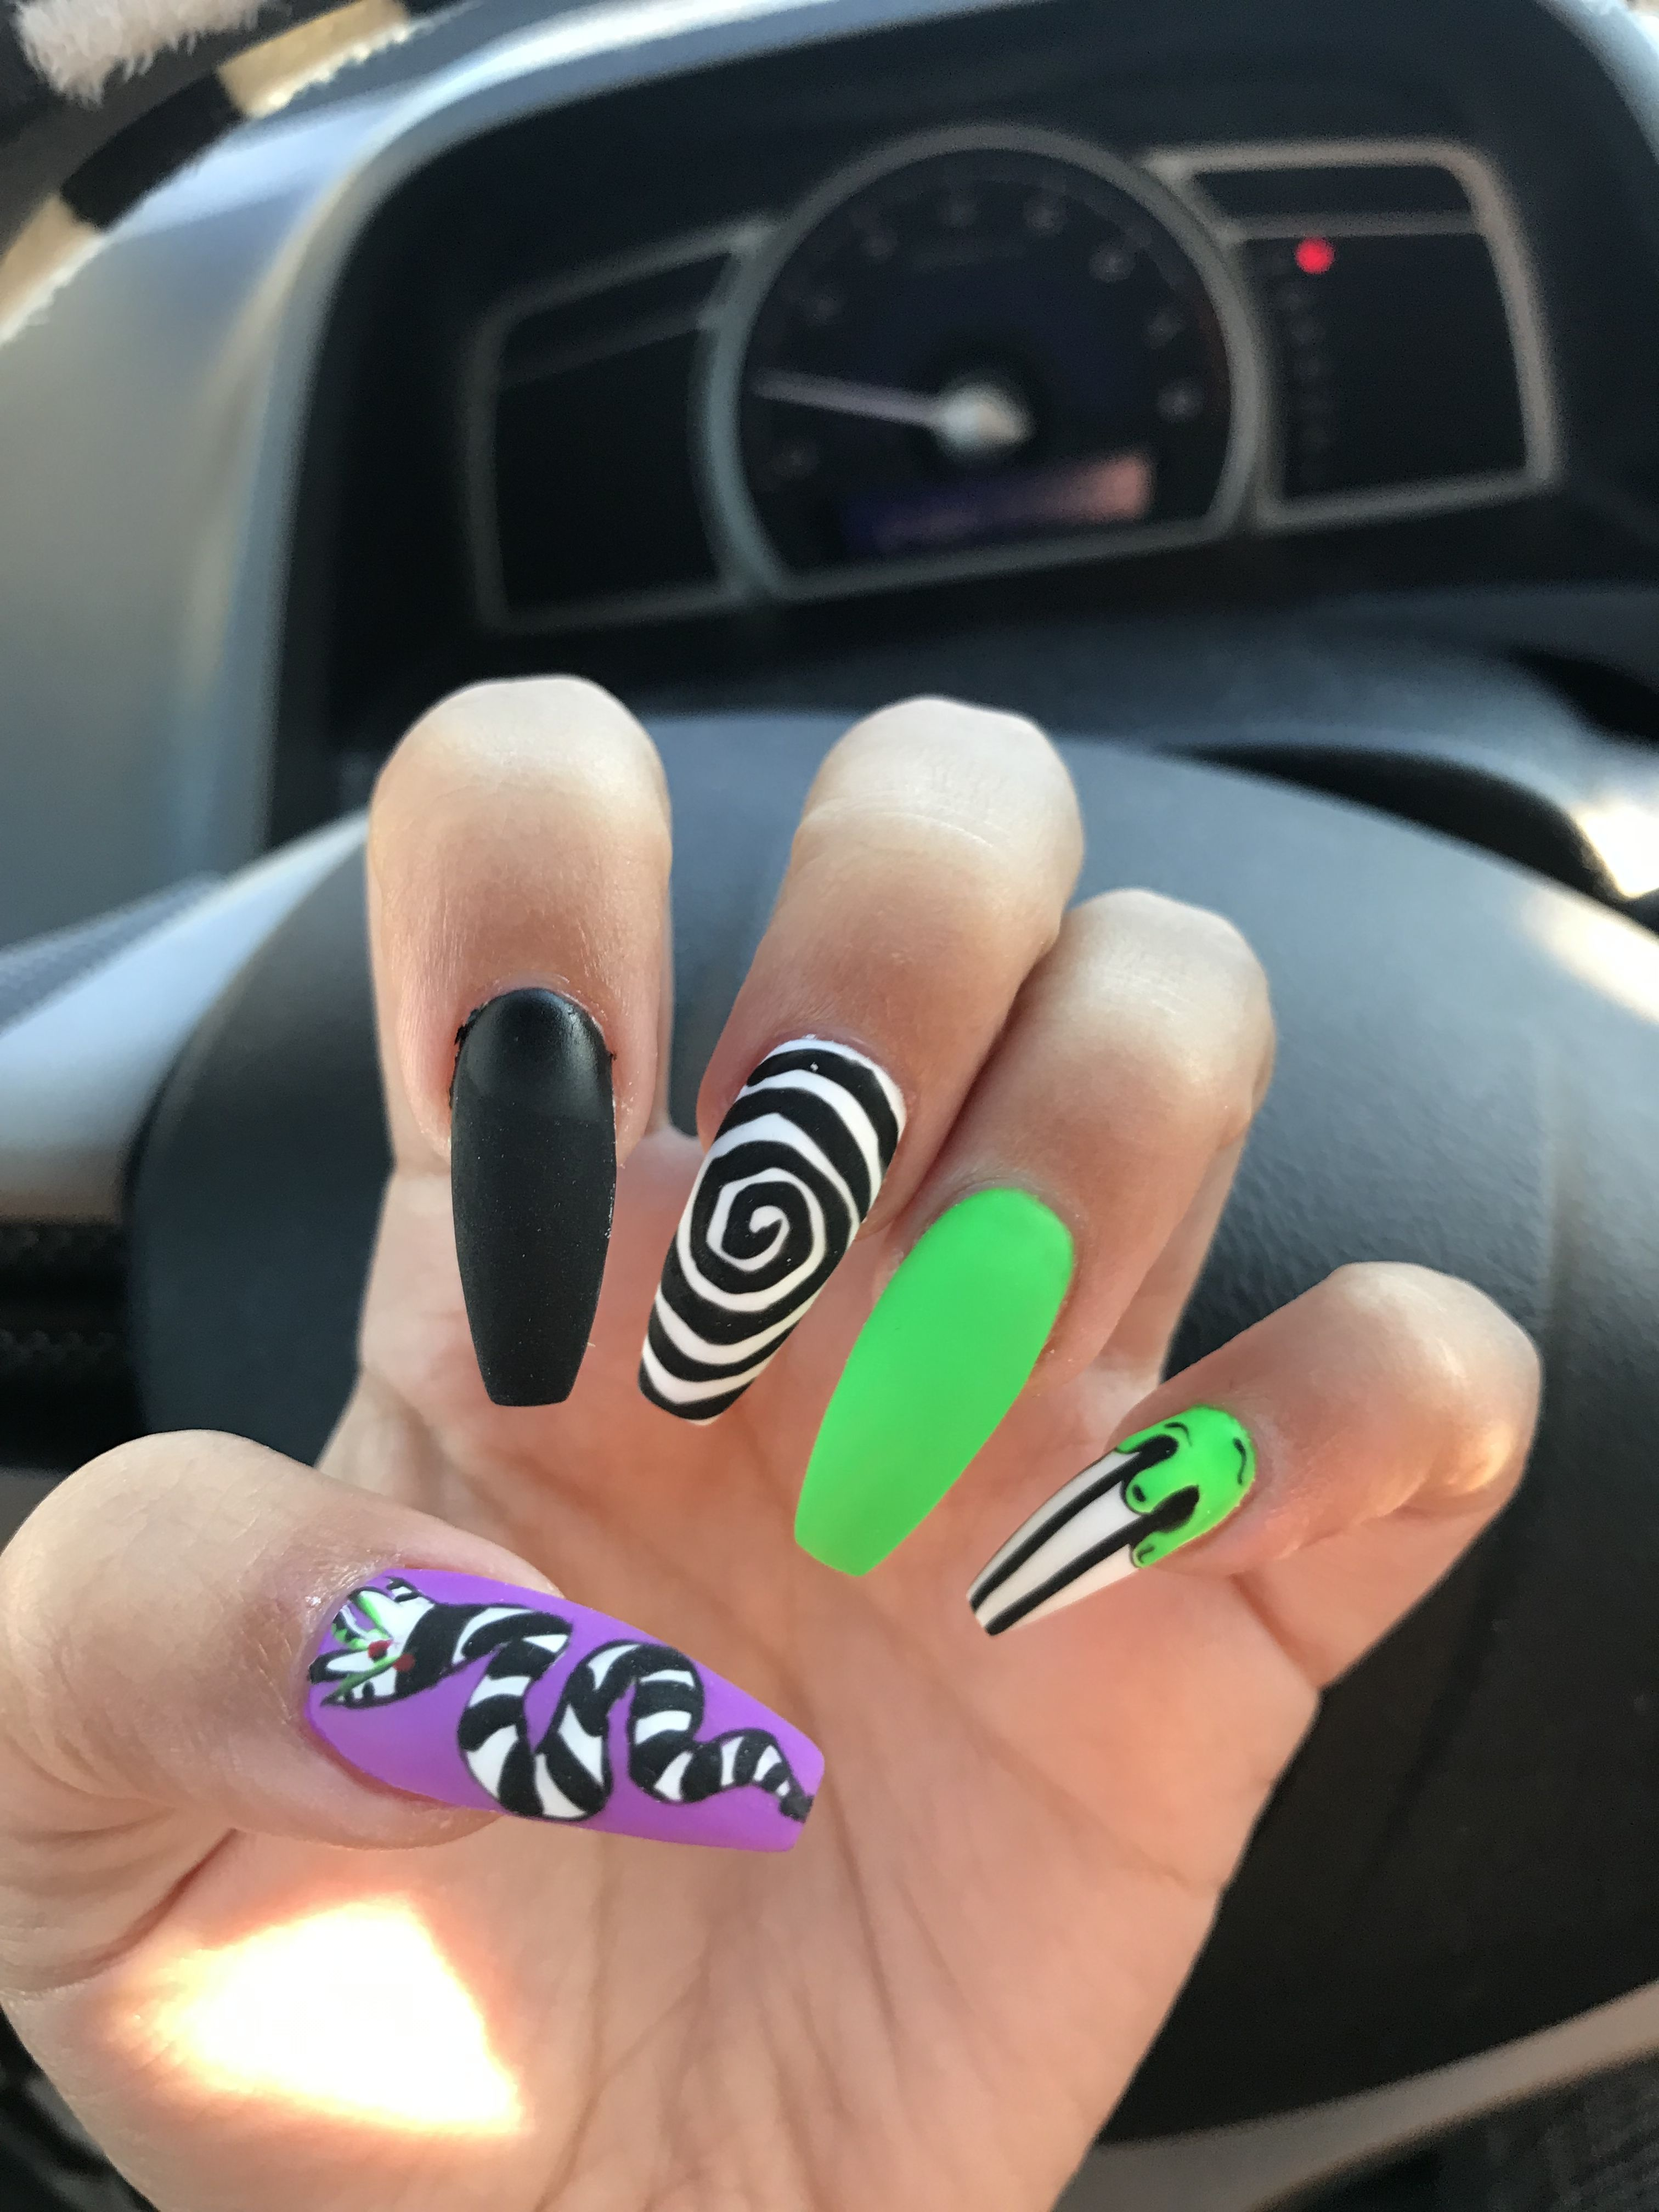 Pin by Andrea Zamudio on Nail inspo | Coffin nails, Nails ...